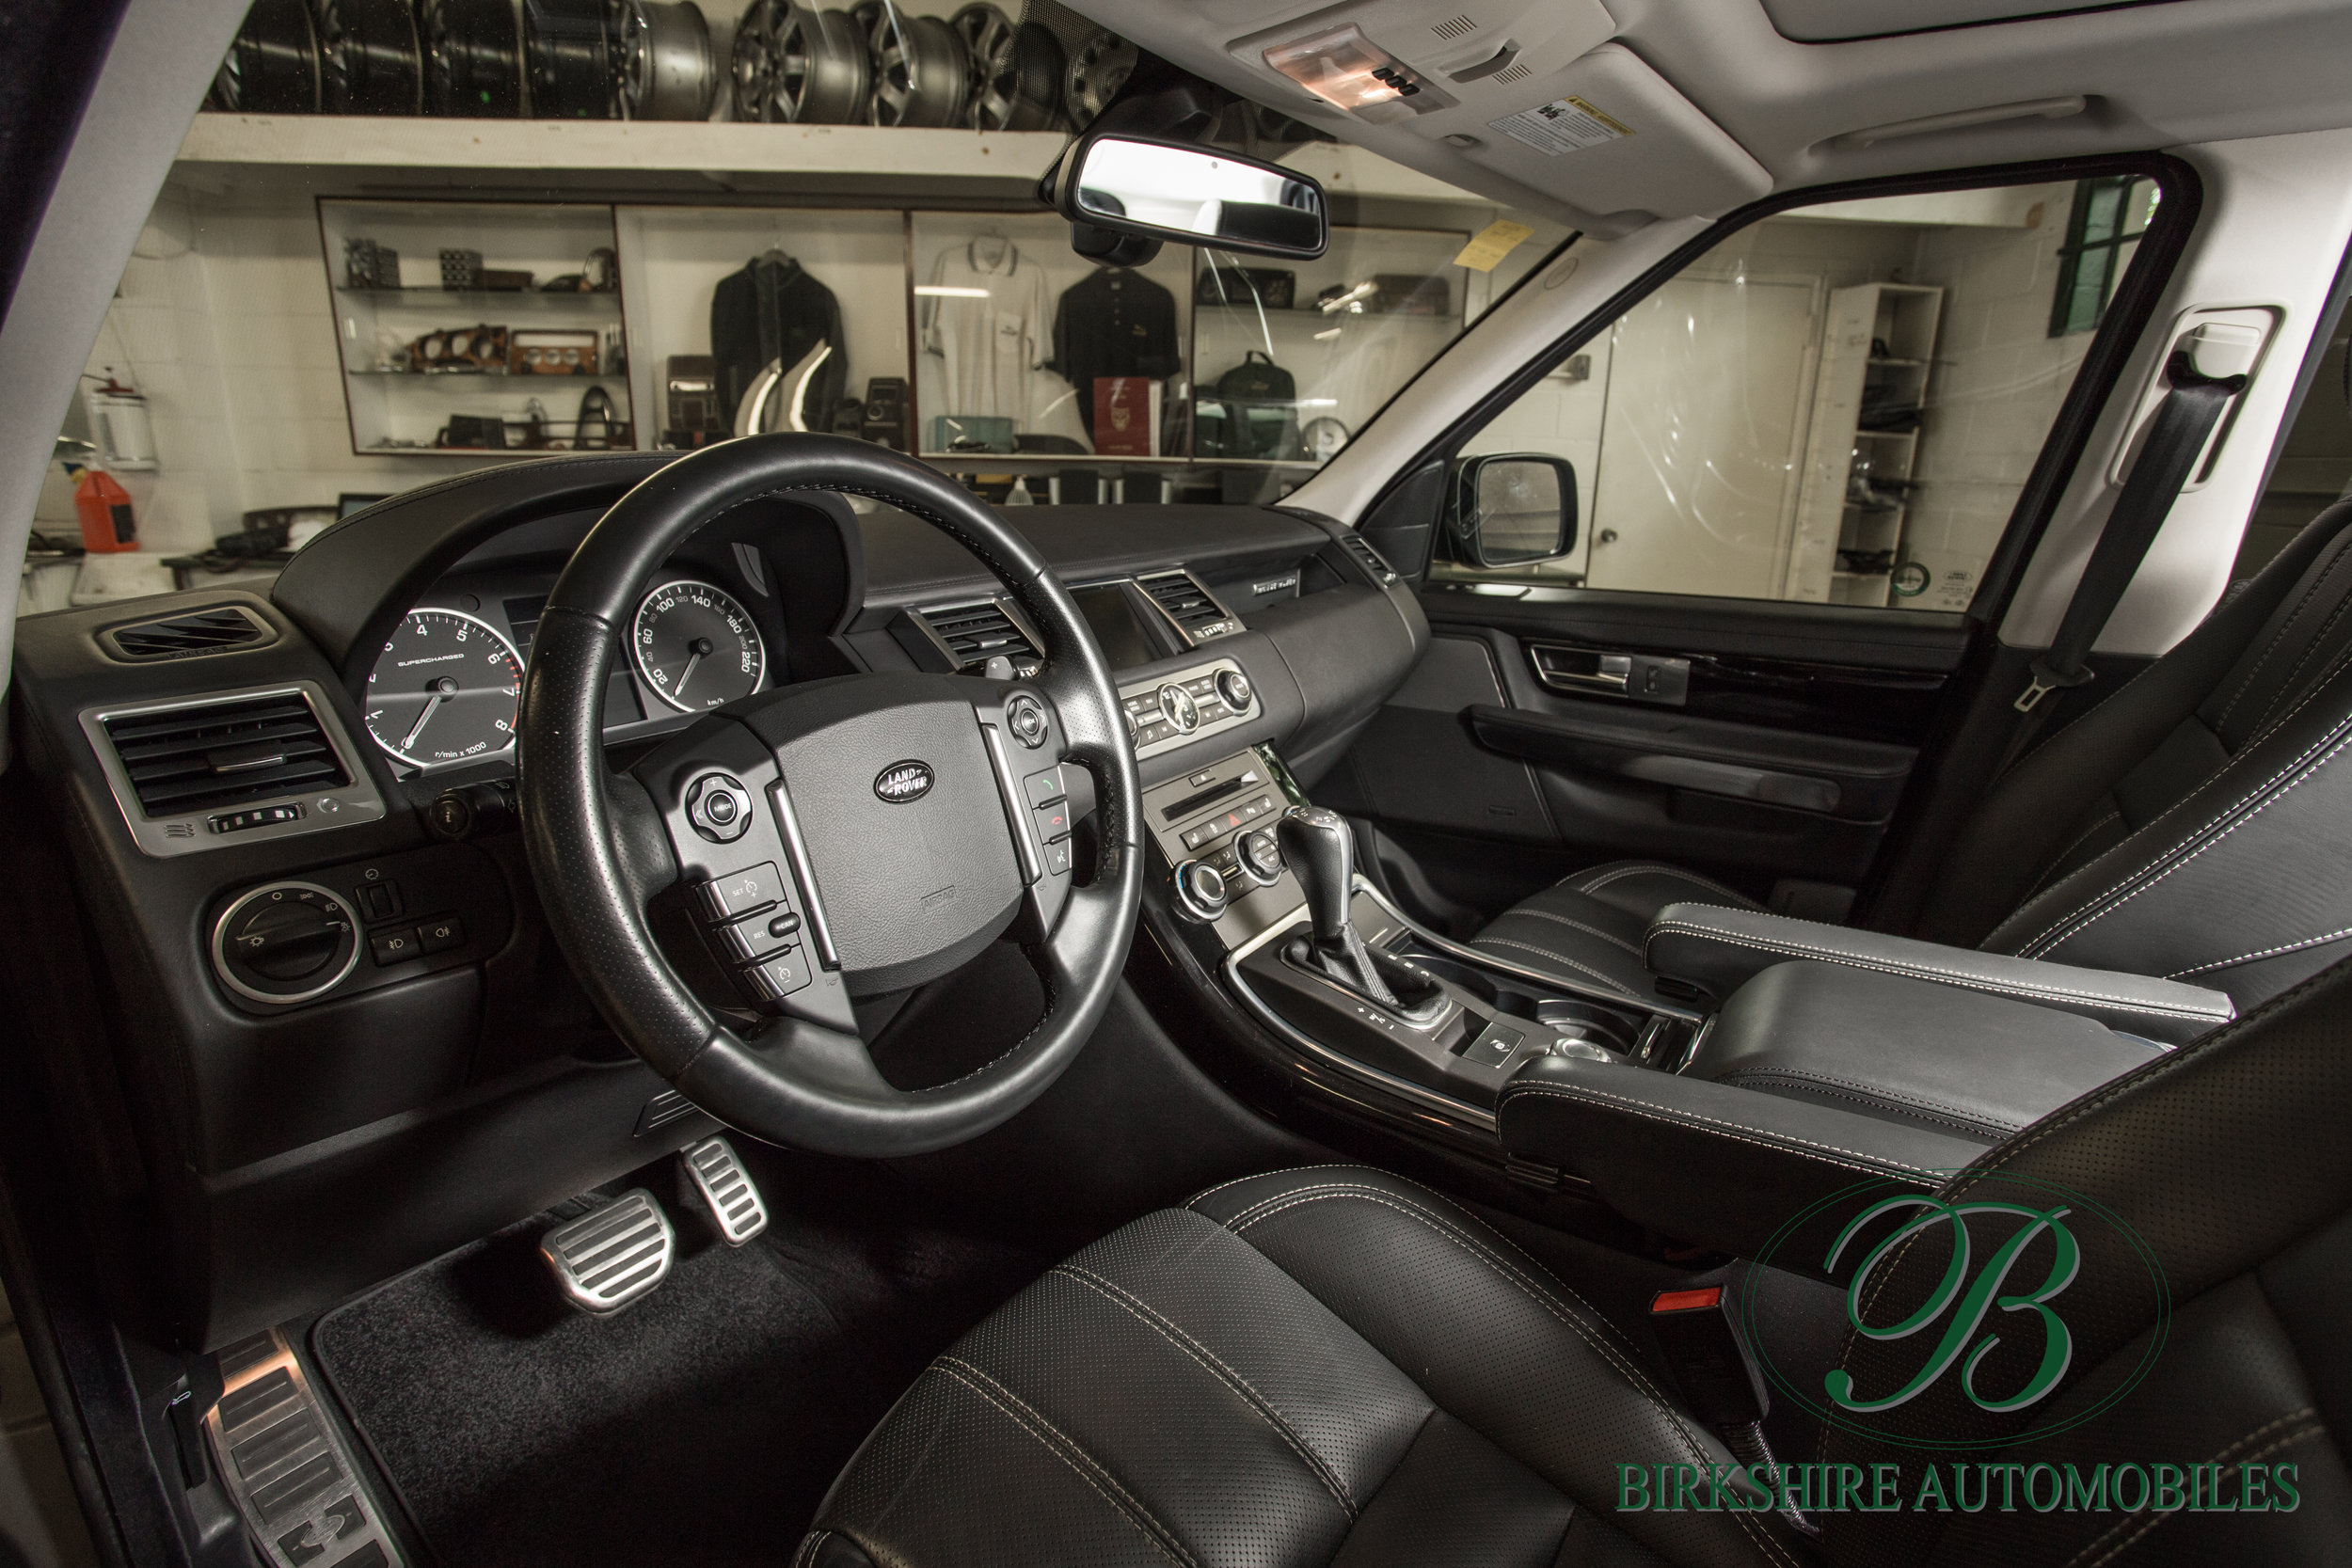 Birkshire Automobiles-17.jpg